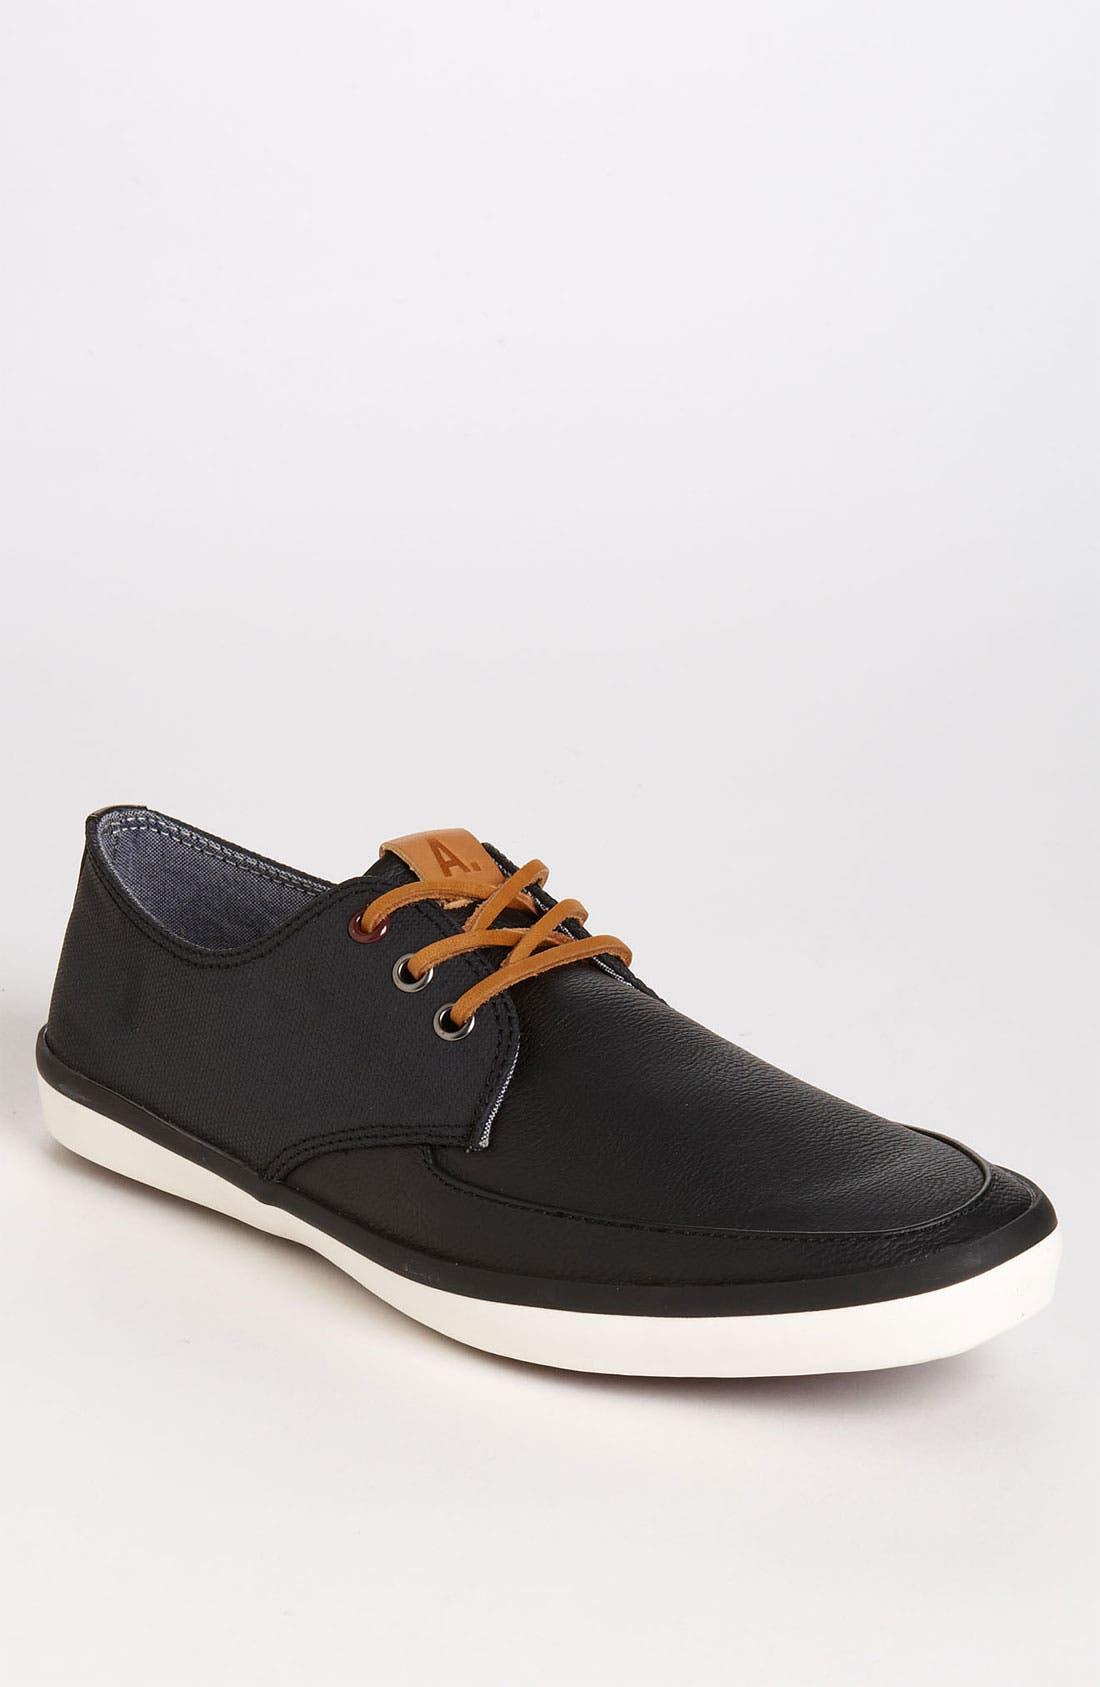 Main Image - ALDO 'Jaremka' Sneaker